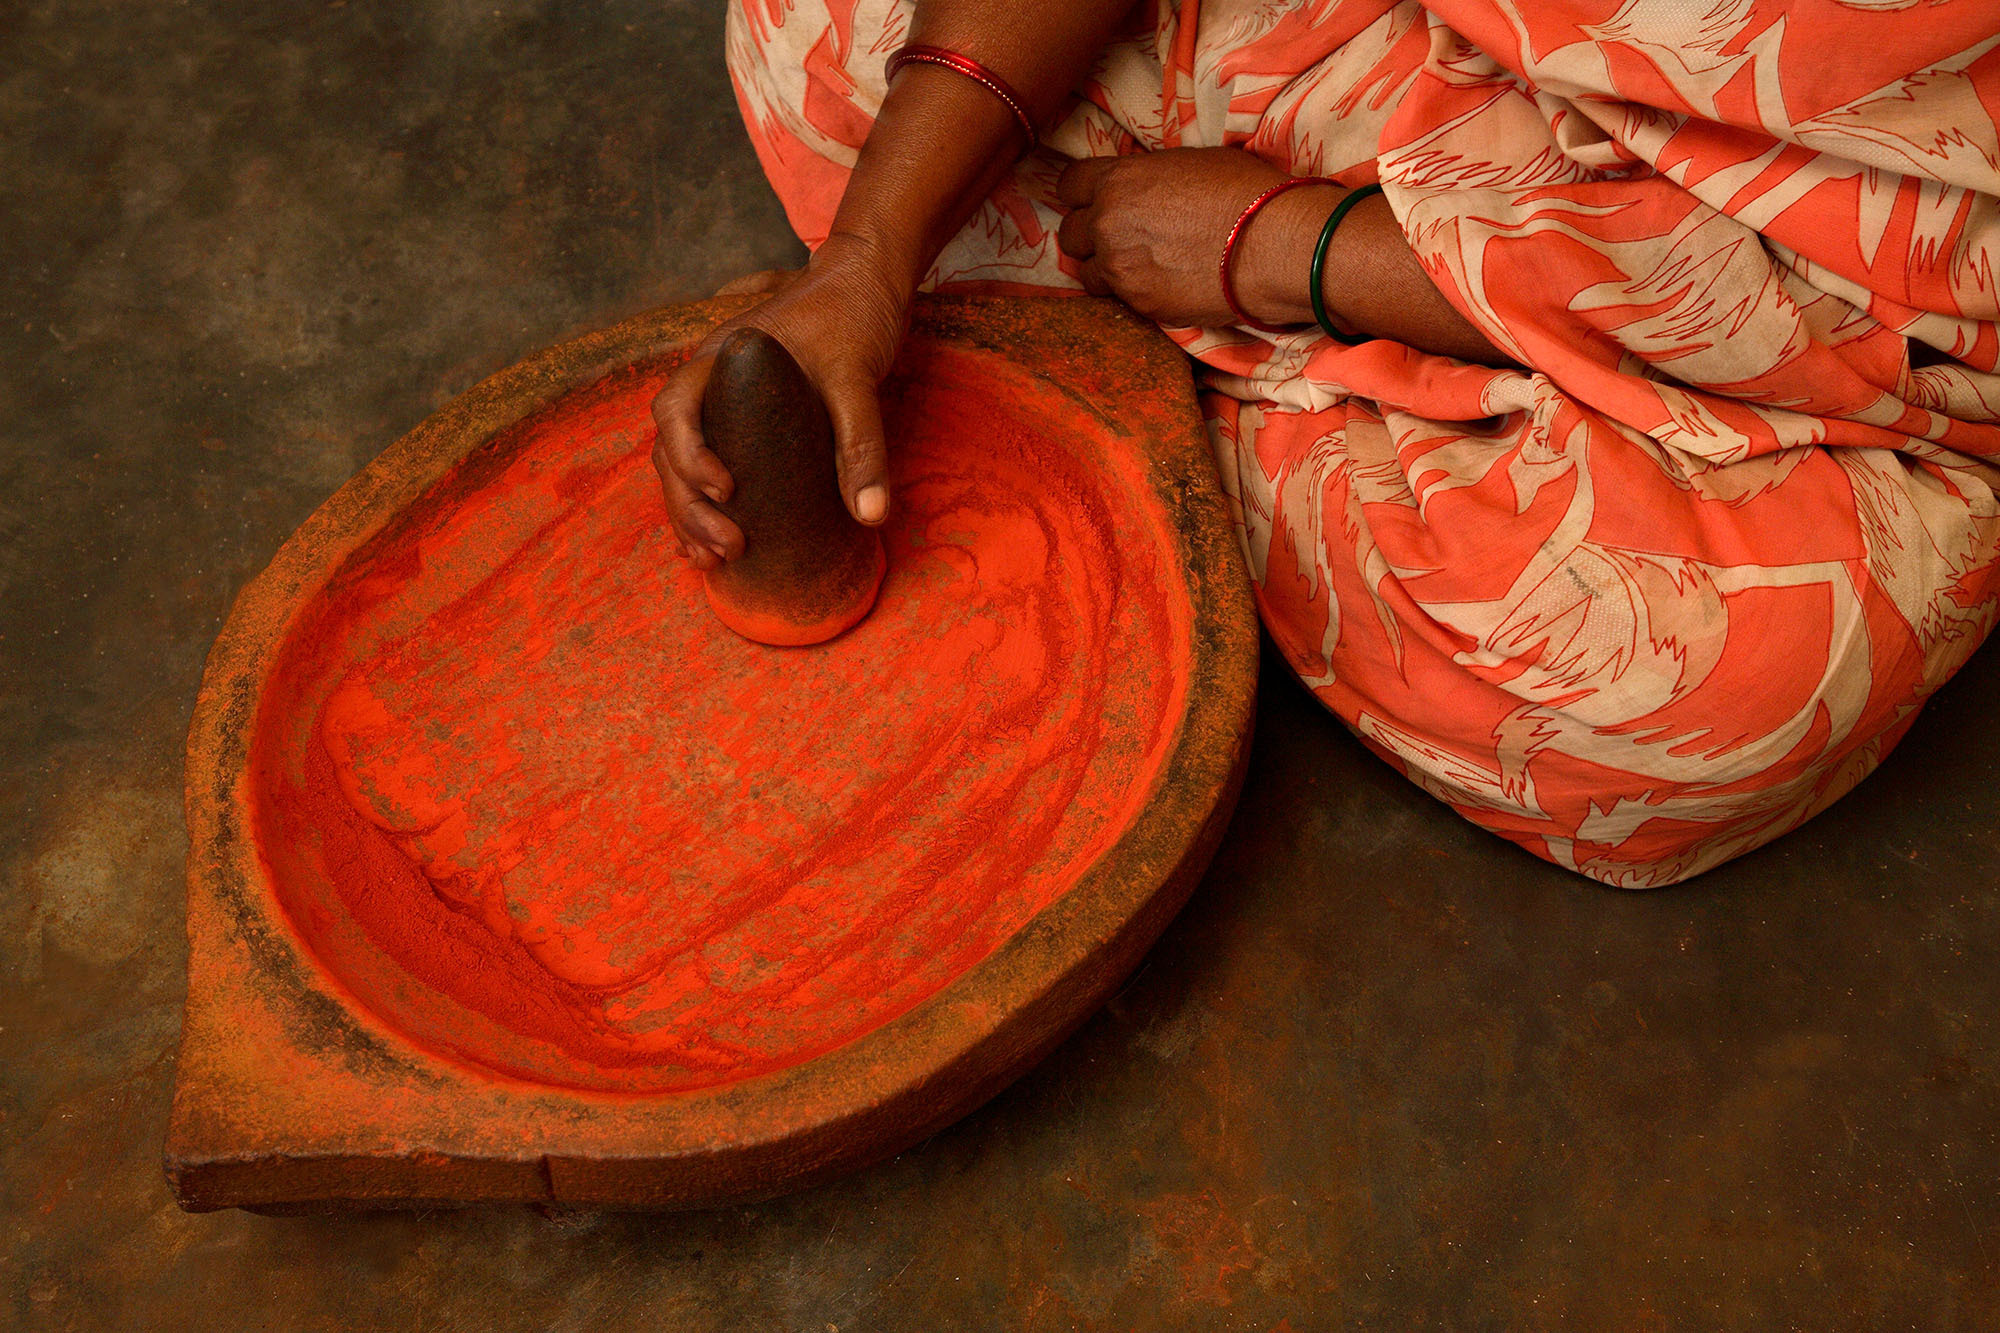 Toxic Lead Contaminates Some Traditional Ayurvedic Medicines